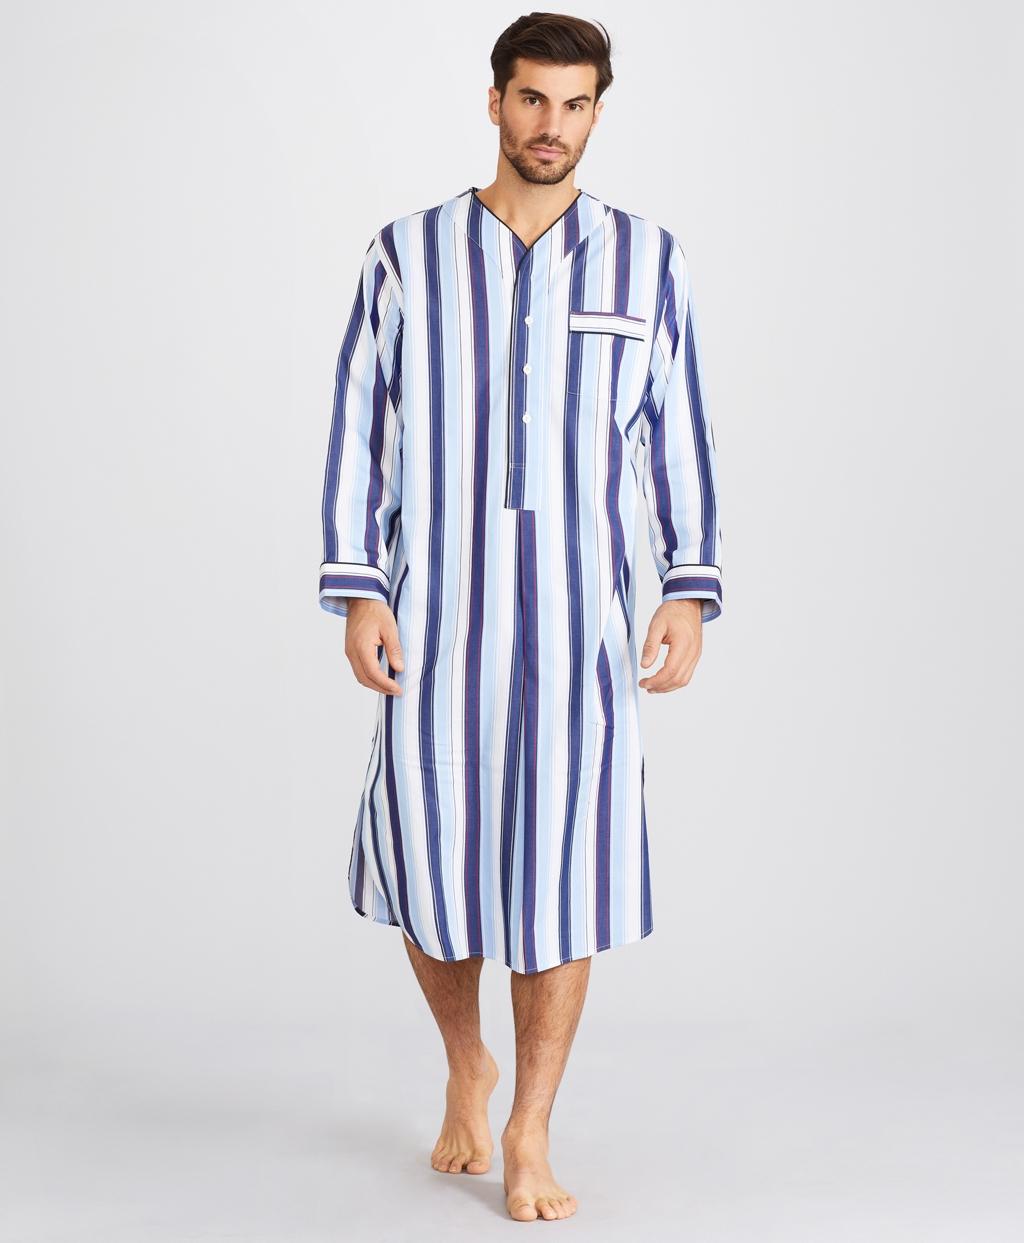 1930s Men's Fashion Guide- What Did Men Wear? Brooks Brothers Mens Bold Stripe Nightshirt $79.50 AT vintagedancer.com